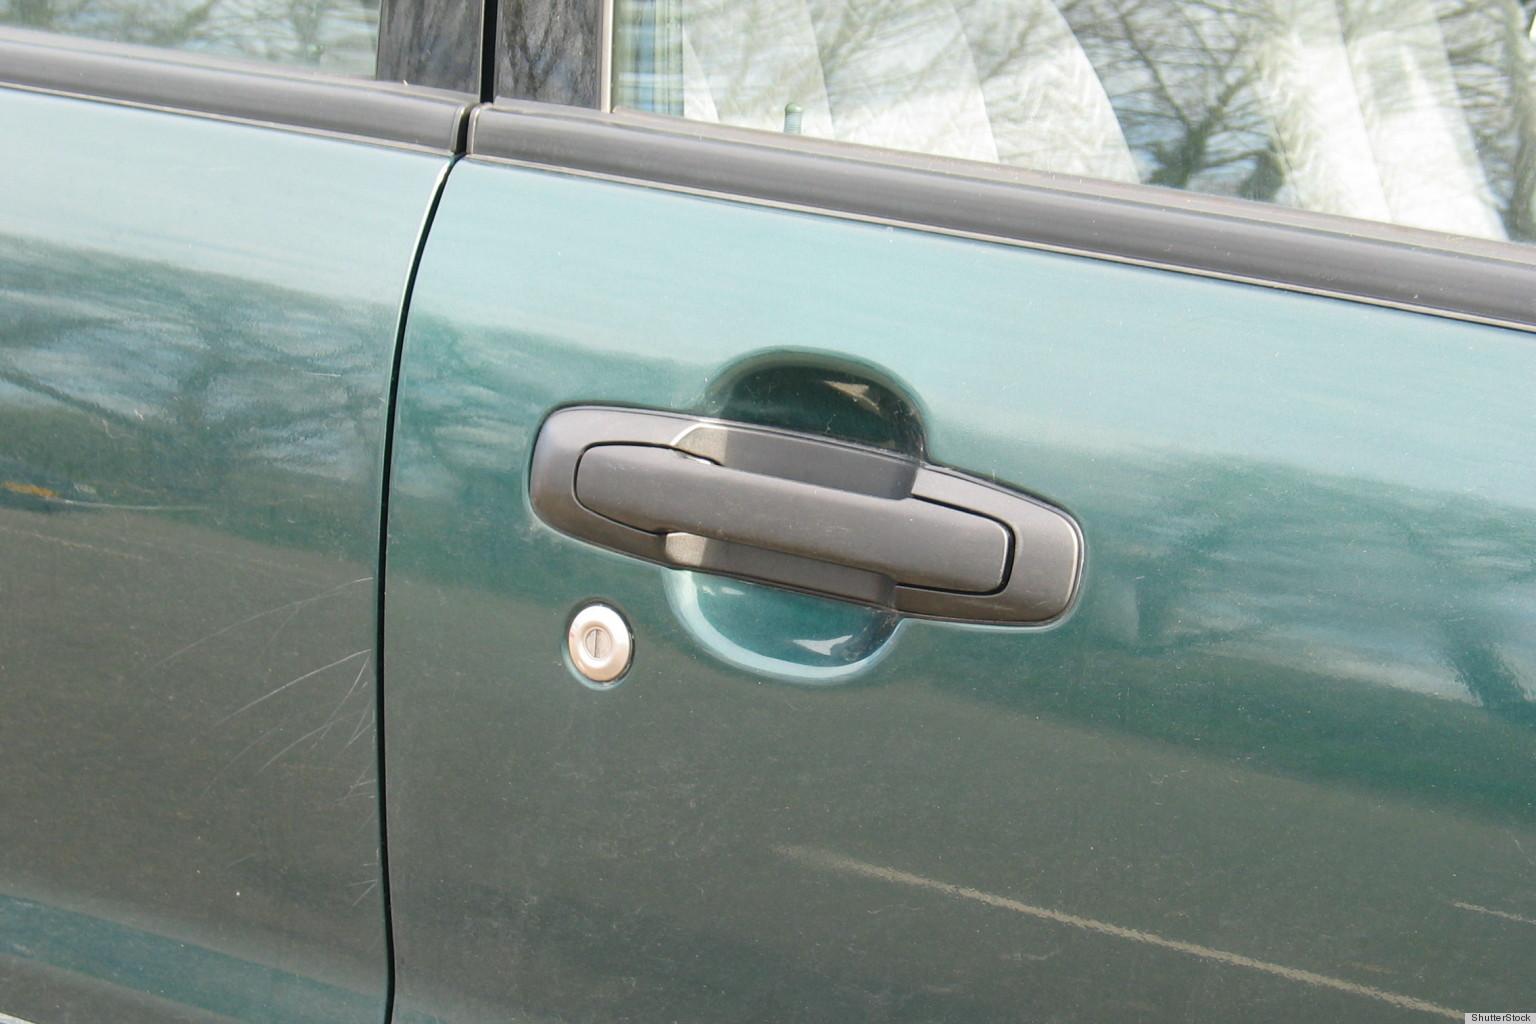 Protect your car door from hitting the garage wall using a pool protect your car door from hitting the garage wall using a pool noodle photos huffpost rubansaba